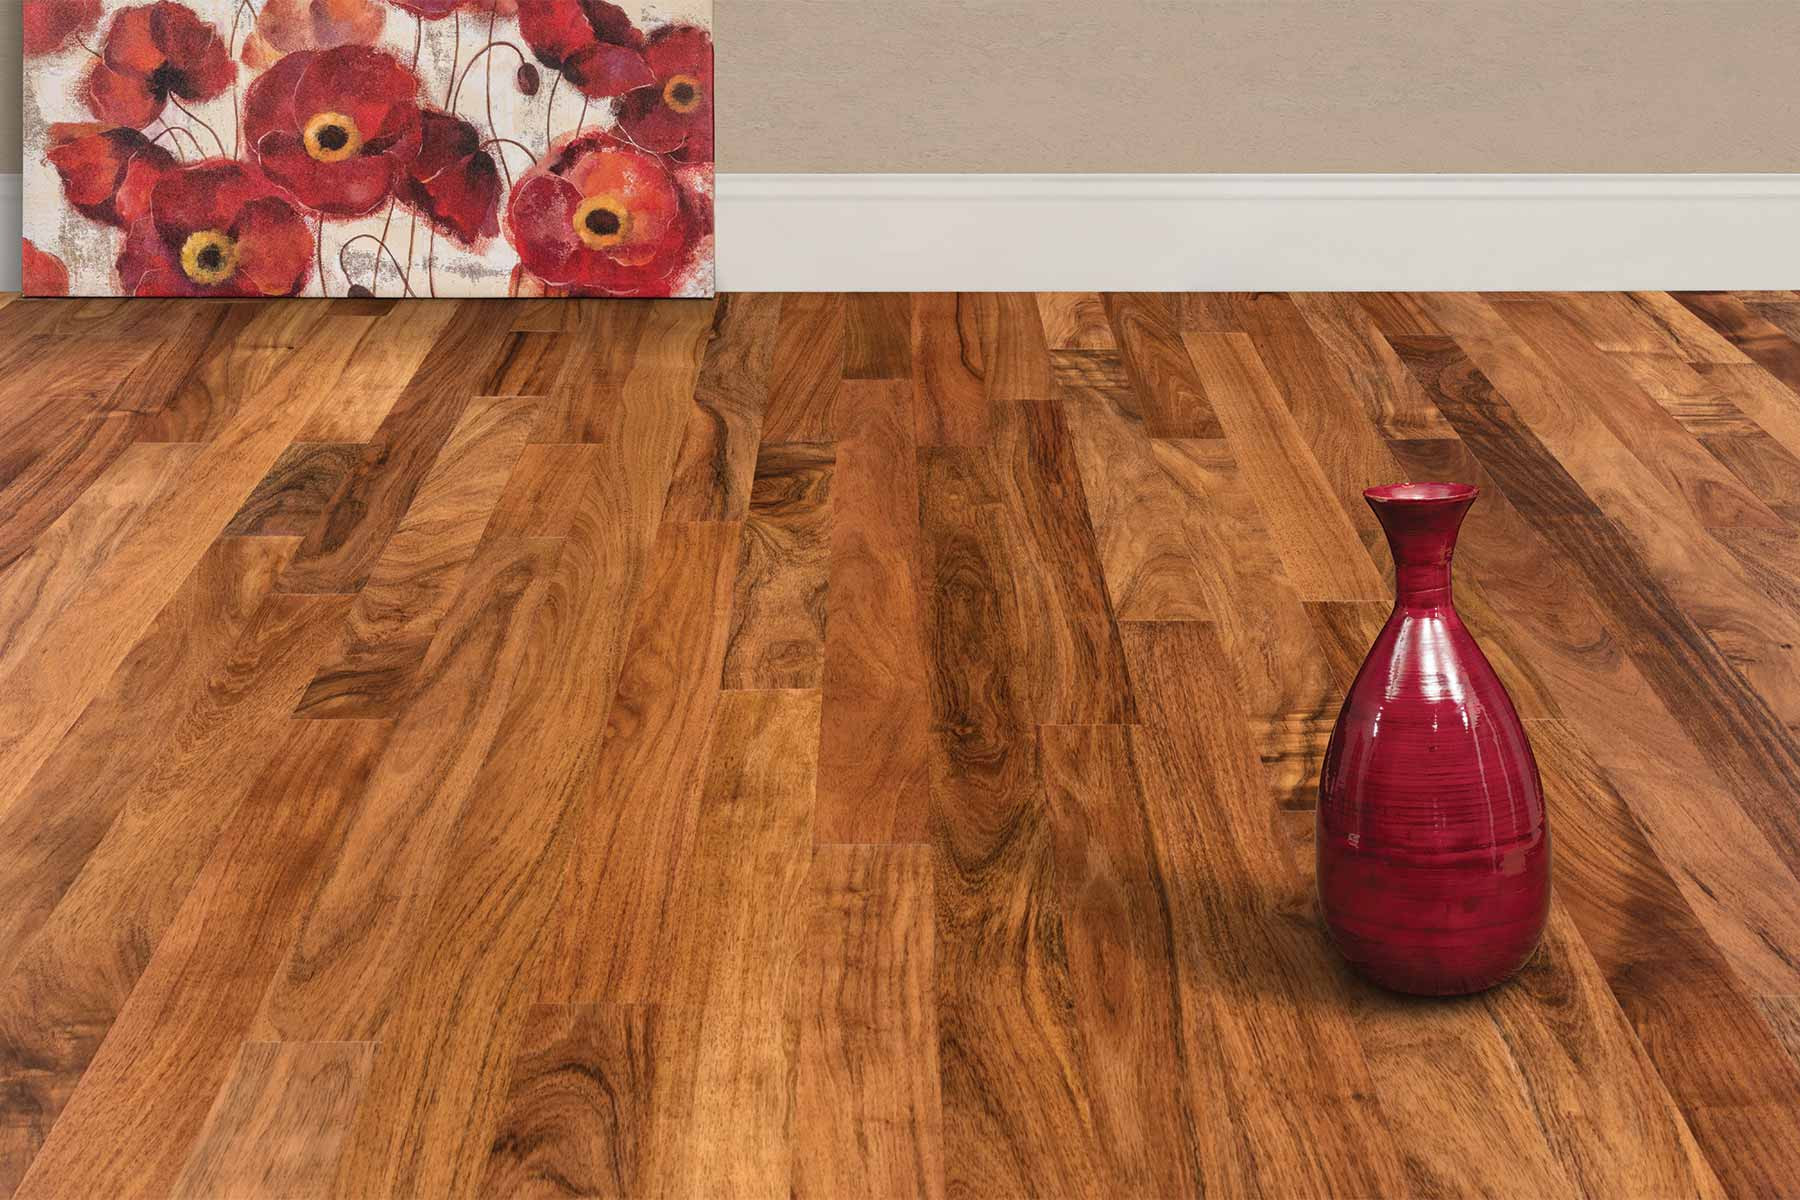 character grade walnut hardwood flooring of 3 natural caribbean walnut in 551a72db b98e 46f0 a36d 98af0349ed55